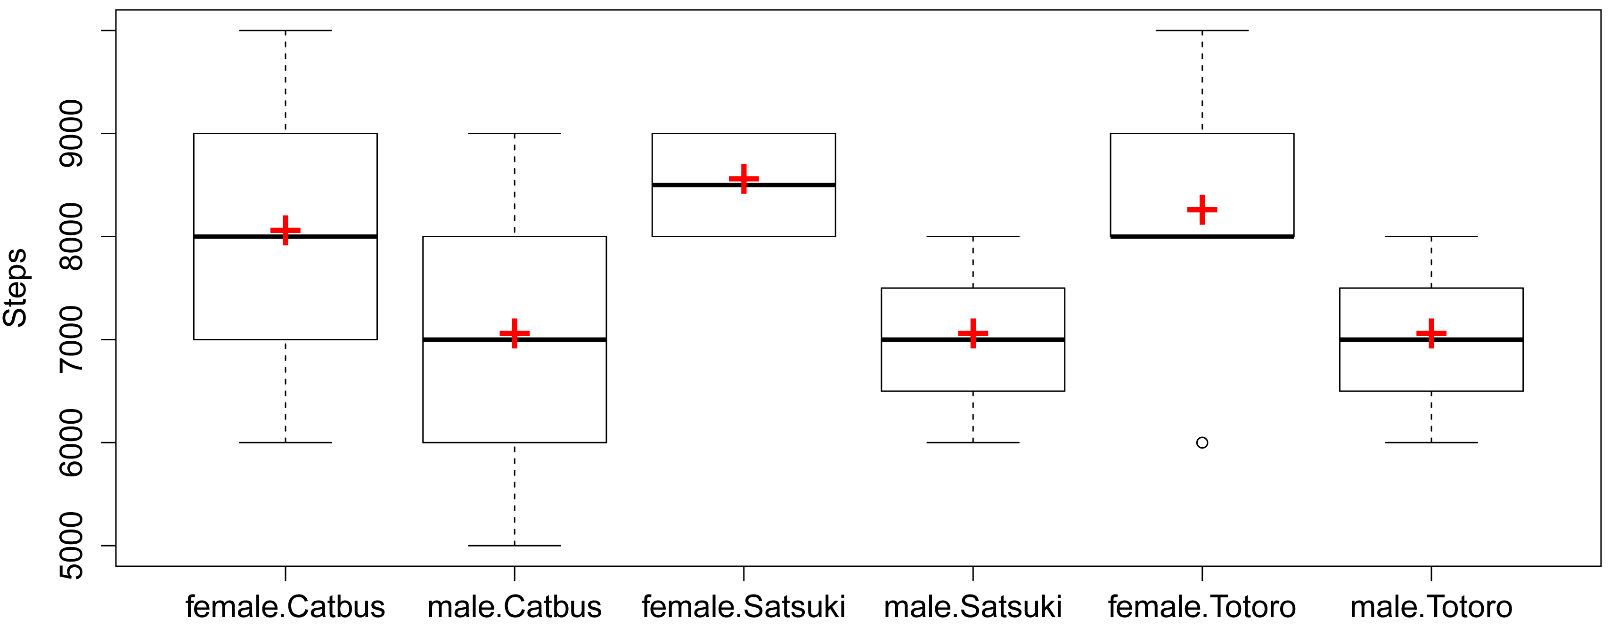 R Handbook: Basic Plots